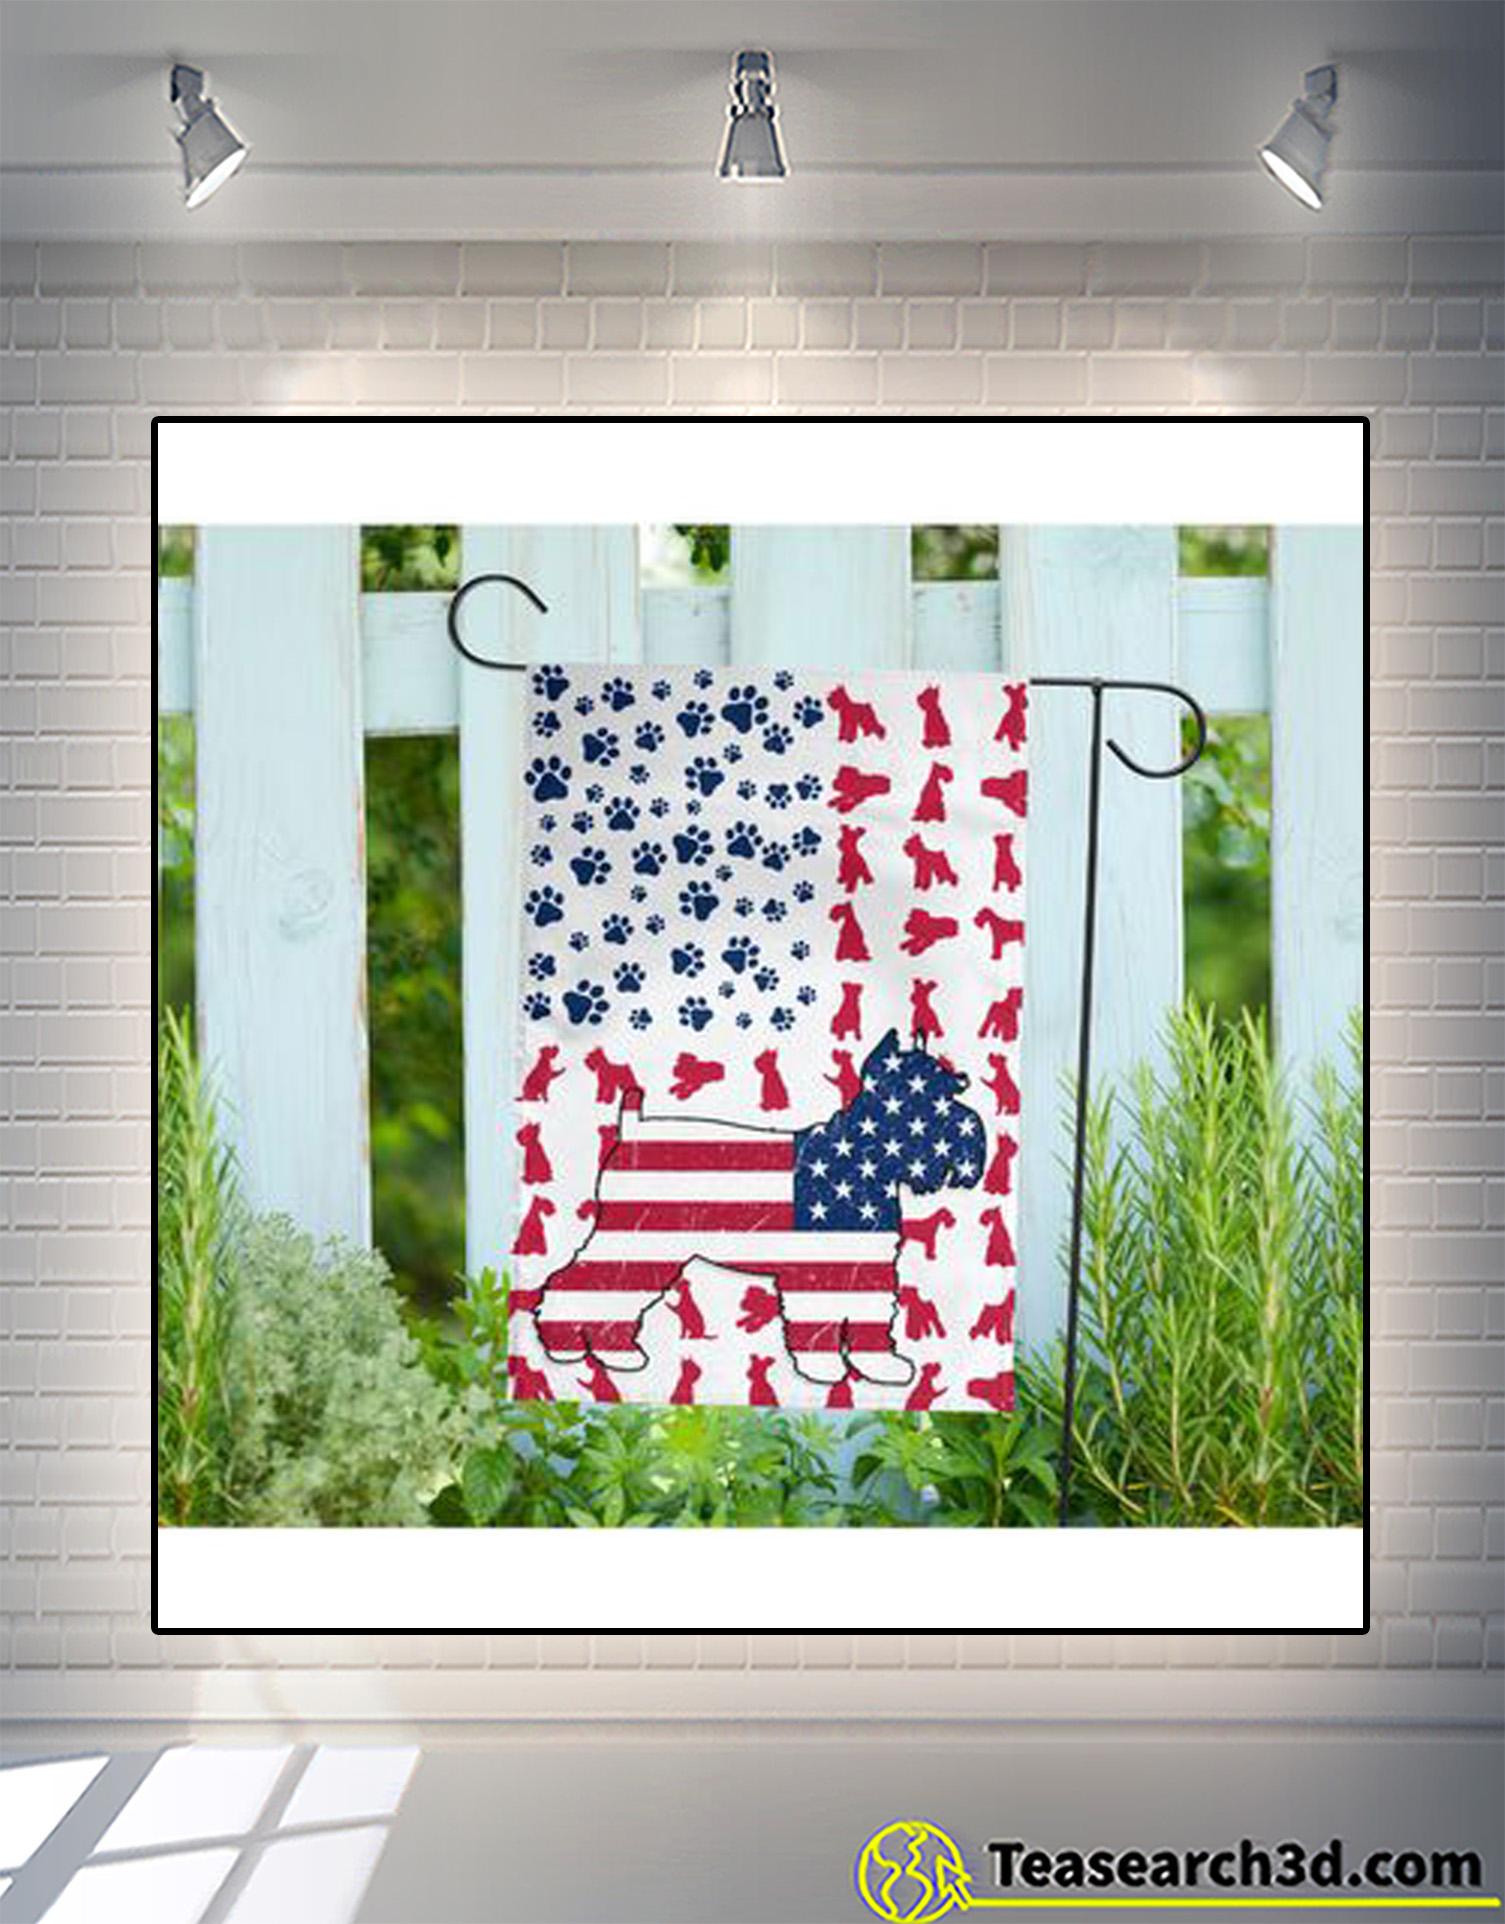 Schnauzer american flag garden-house flag